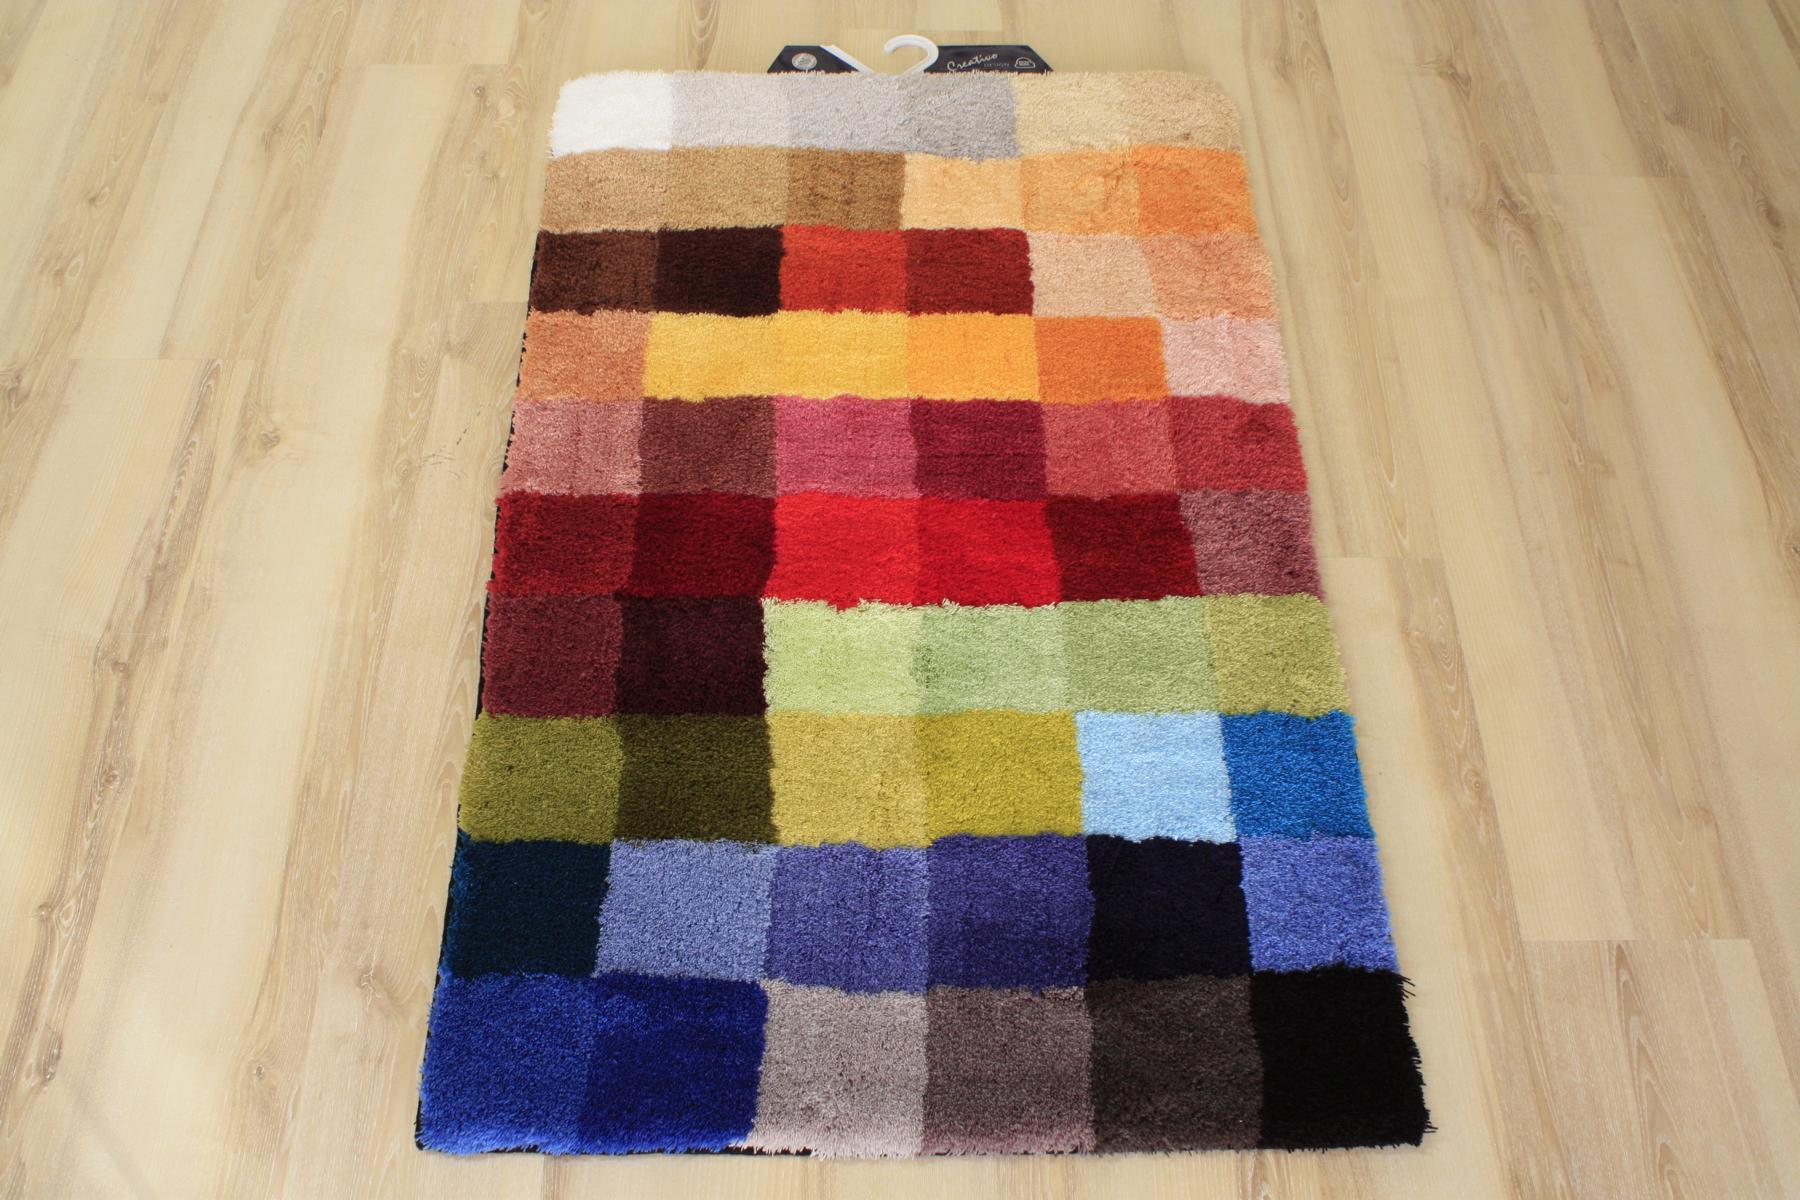 bathroom rug kleine wolke cubetto multicolour 65x90 cm ebay. Black Bedroom Furniture Sets. Home Design Ideas